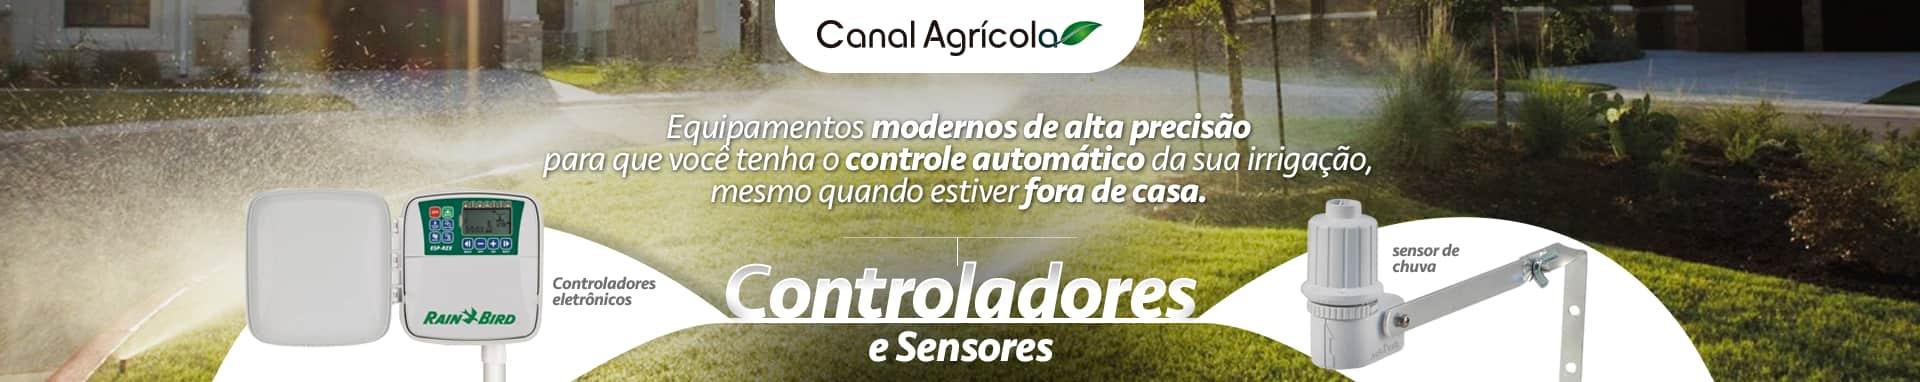 Controladores e Sensores